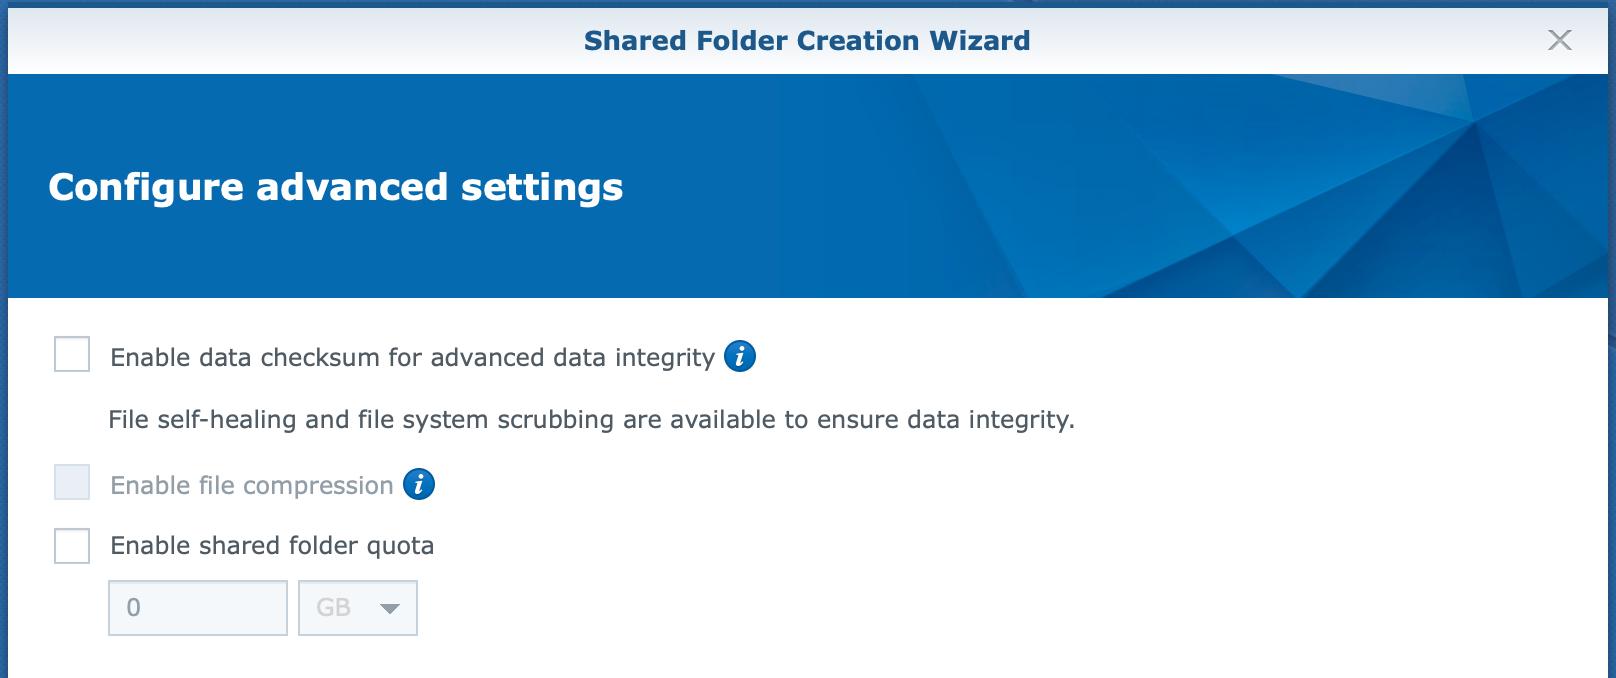 synology, shared folder, create wizard, advanced settings, dsm6